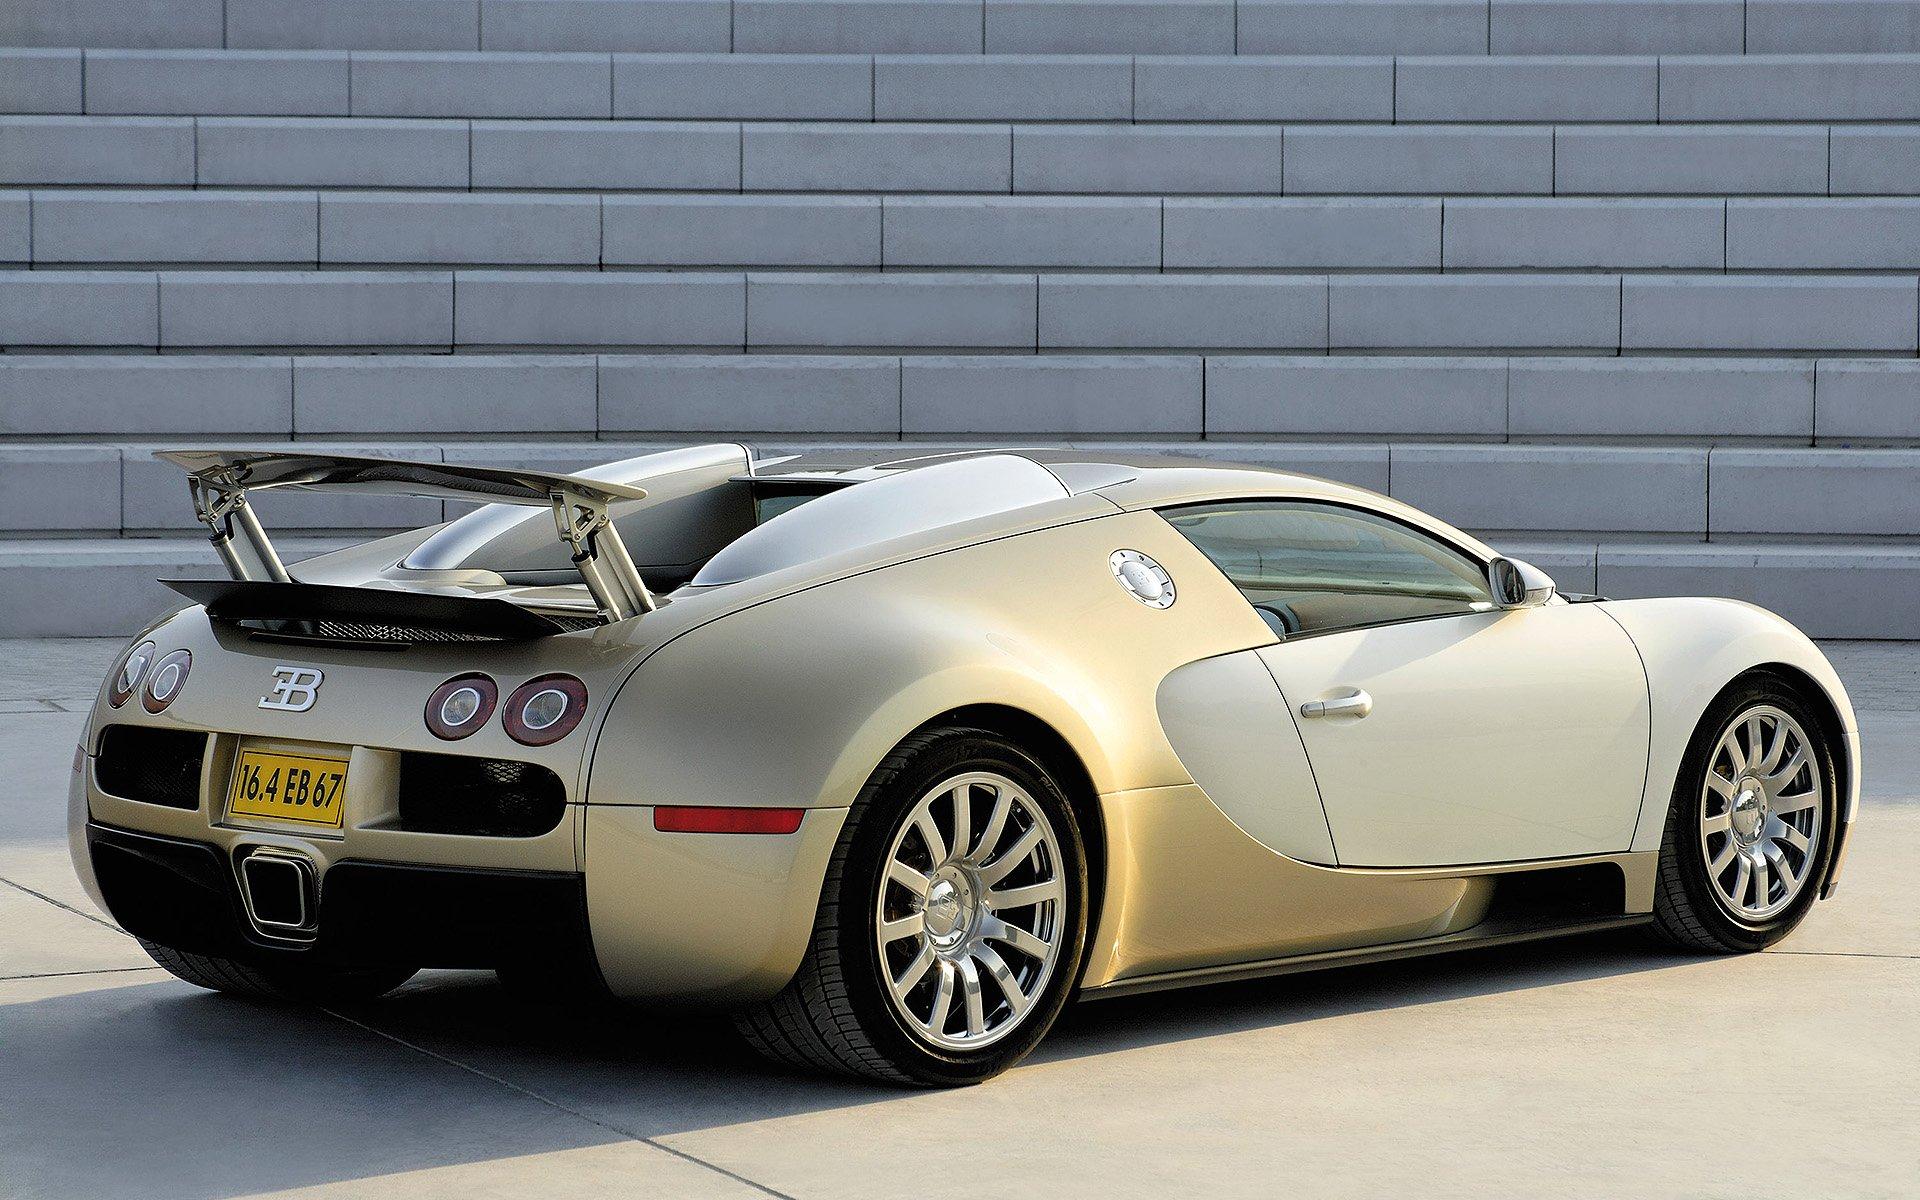 Bugatti Veyron, бугатти вейрон, автомобили, cars